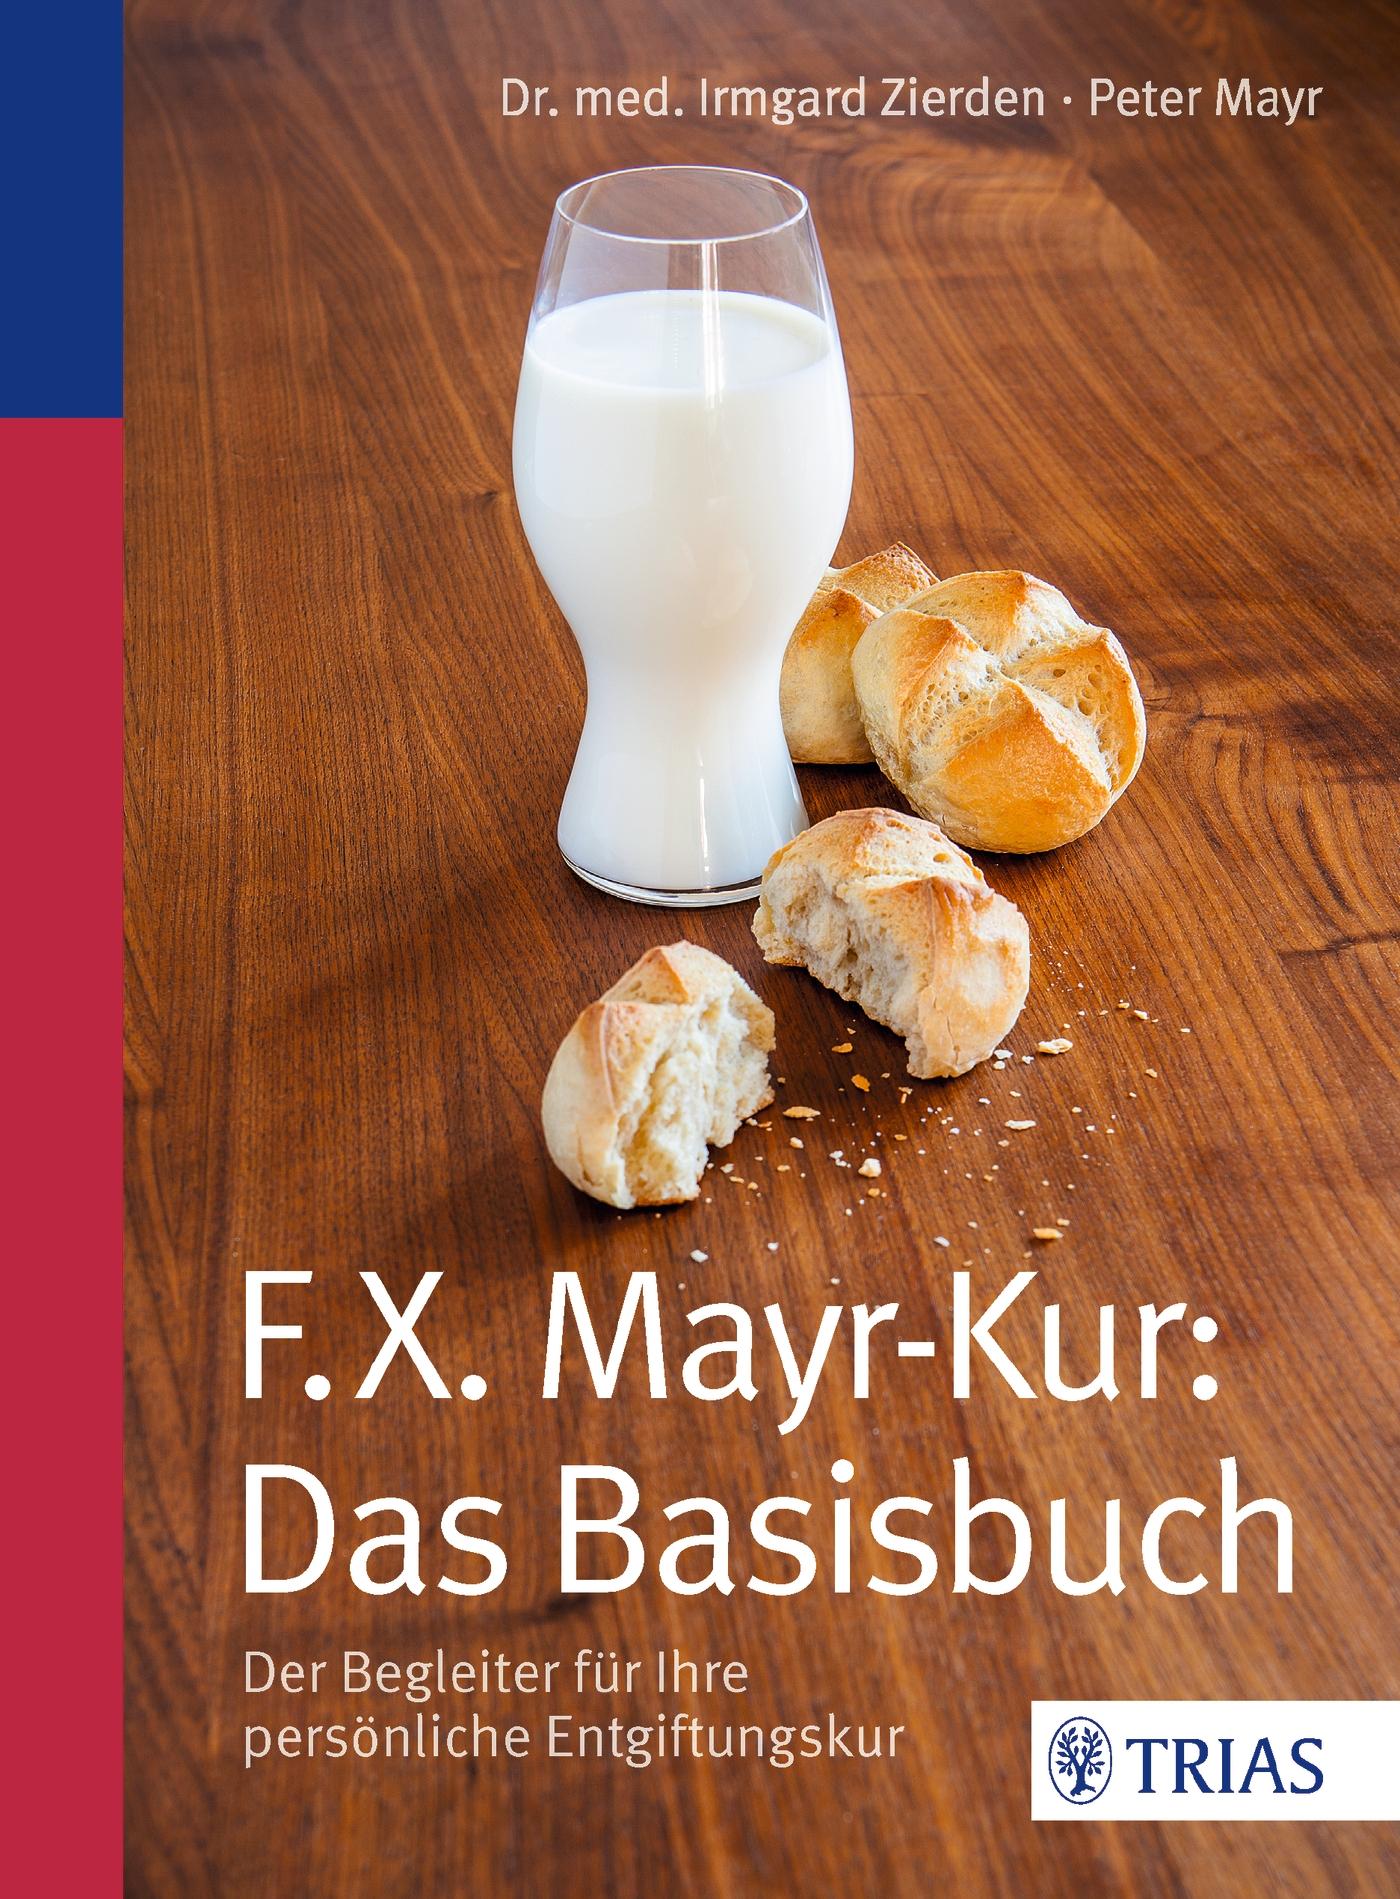 F.X.Mayr-Kur: Das Basisbuch